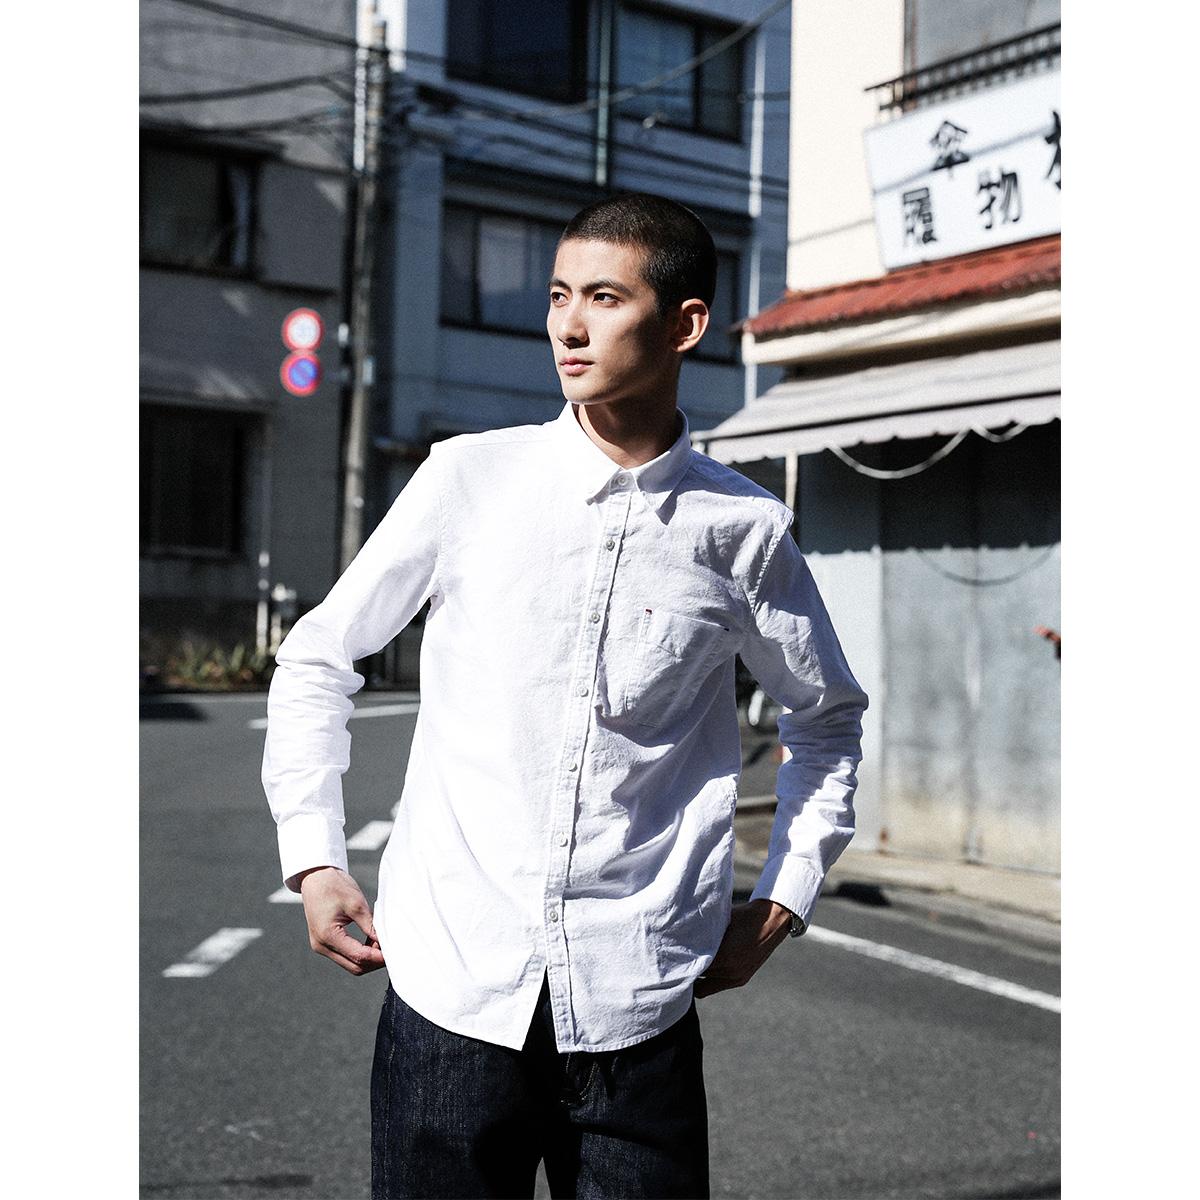 GarCle Labo 原创设计男装基础款纯色长袖牛津纺修身剪裁衬衫